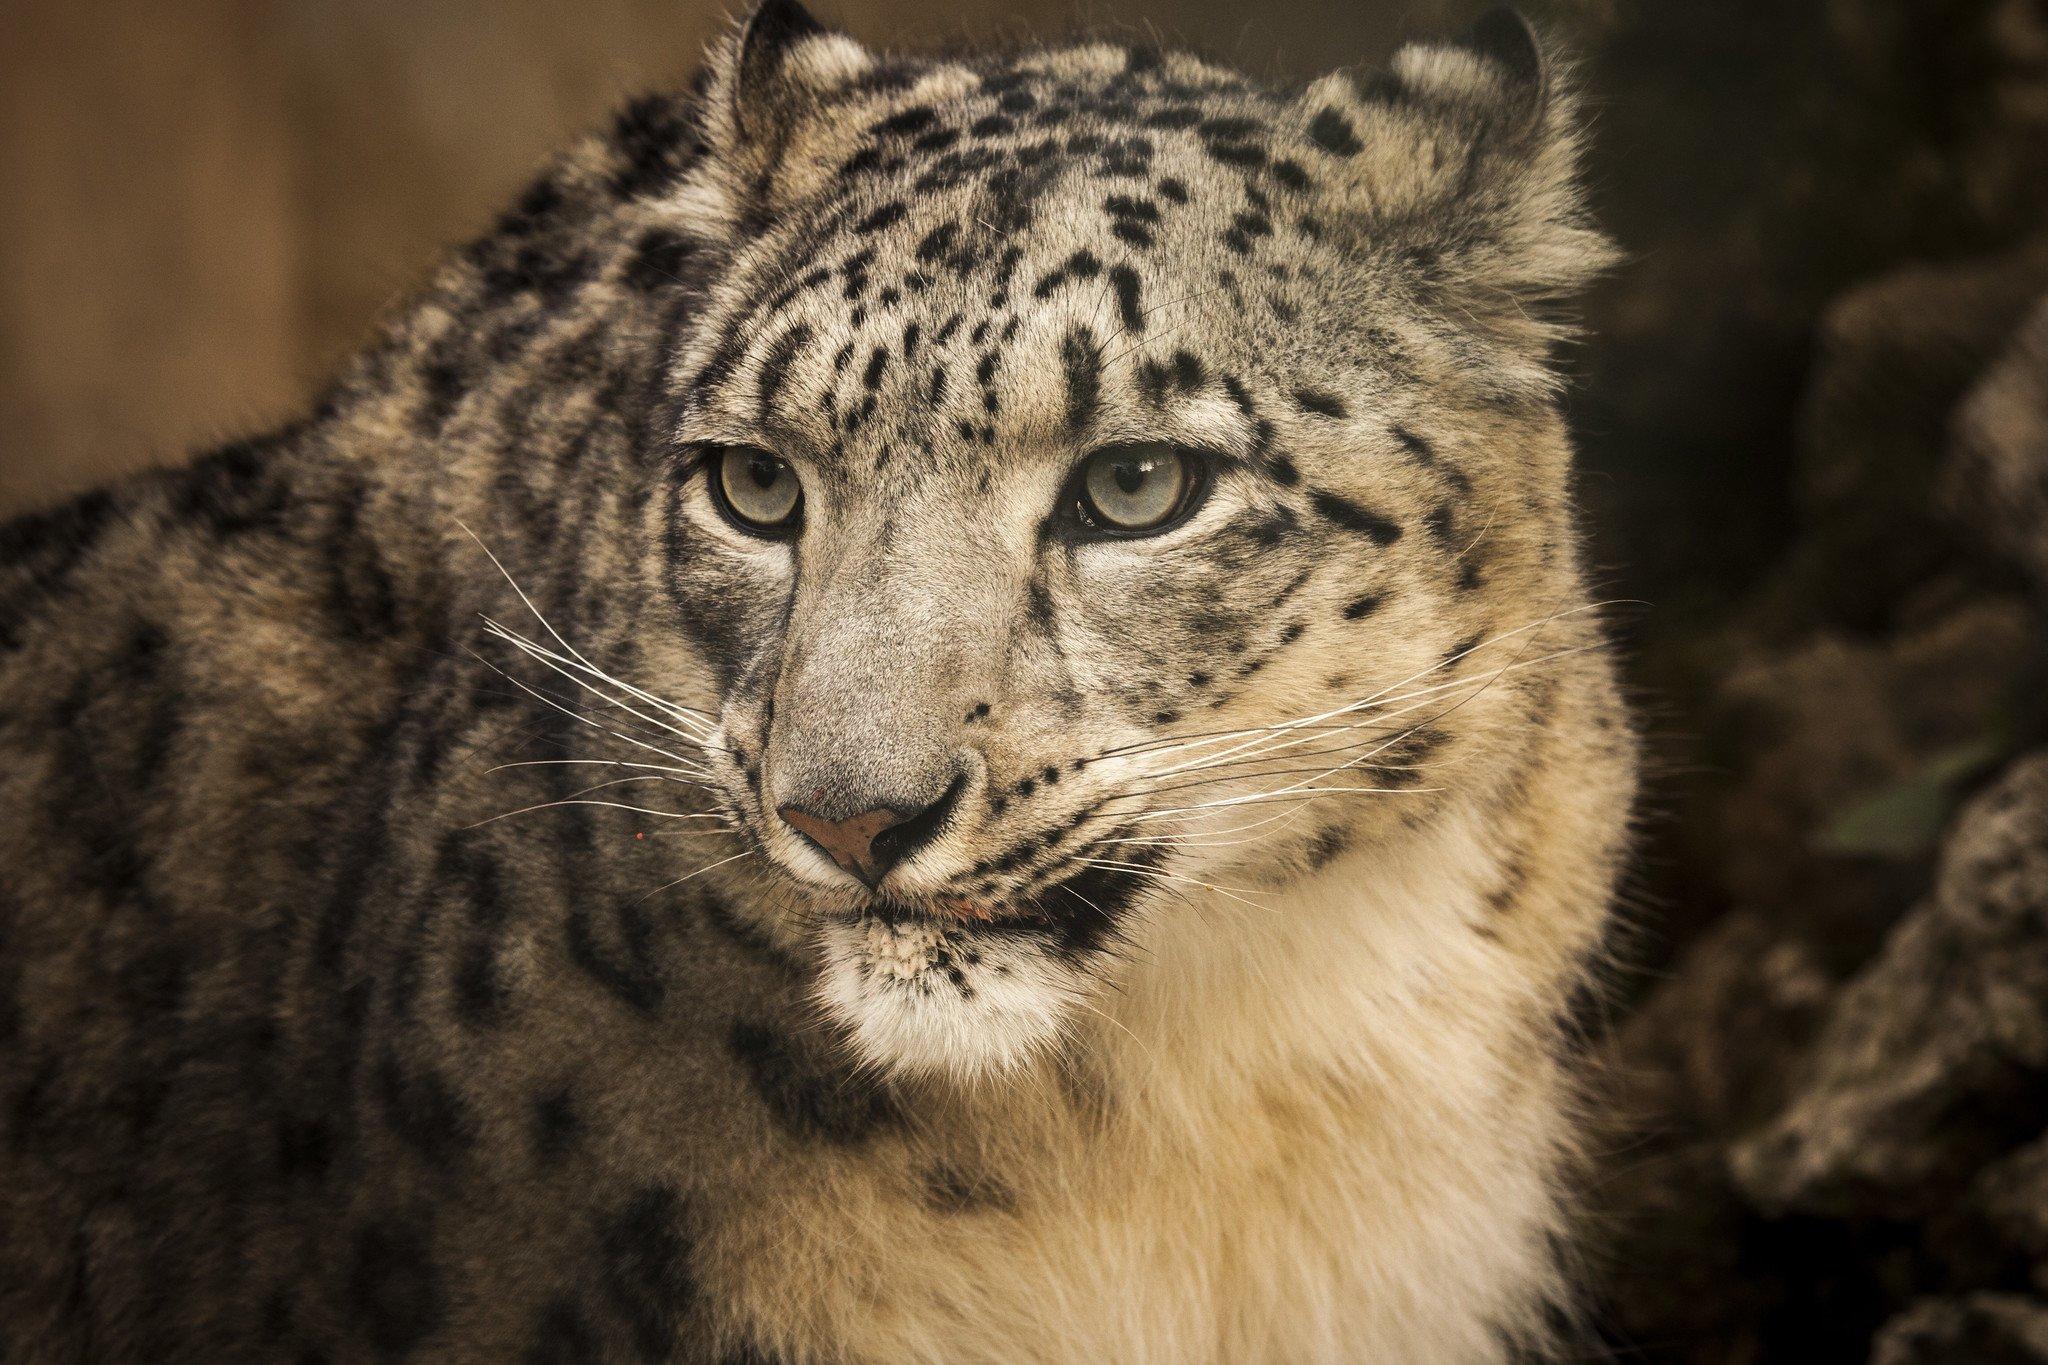 Snow leopard, Pakistan. Image source: Jameel Ahmed, Walkabout films/ U.S. Embassy